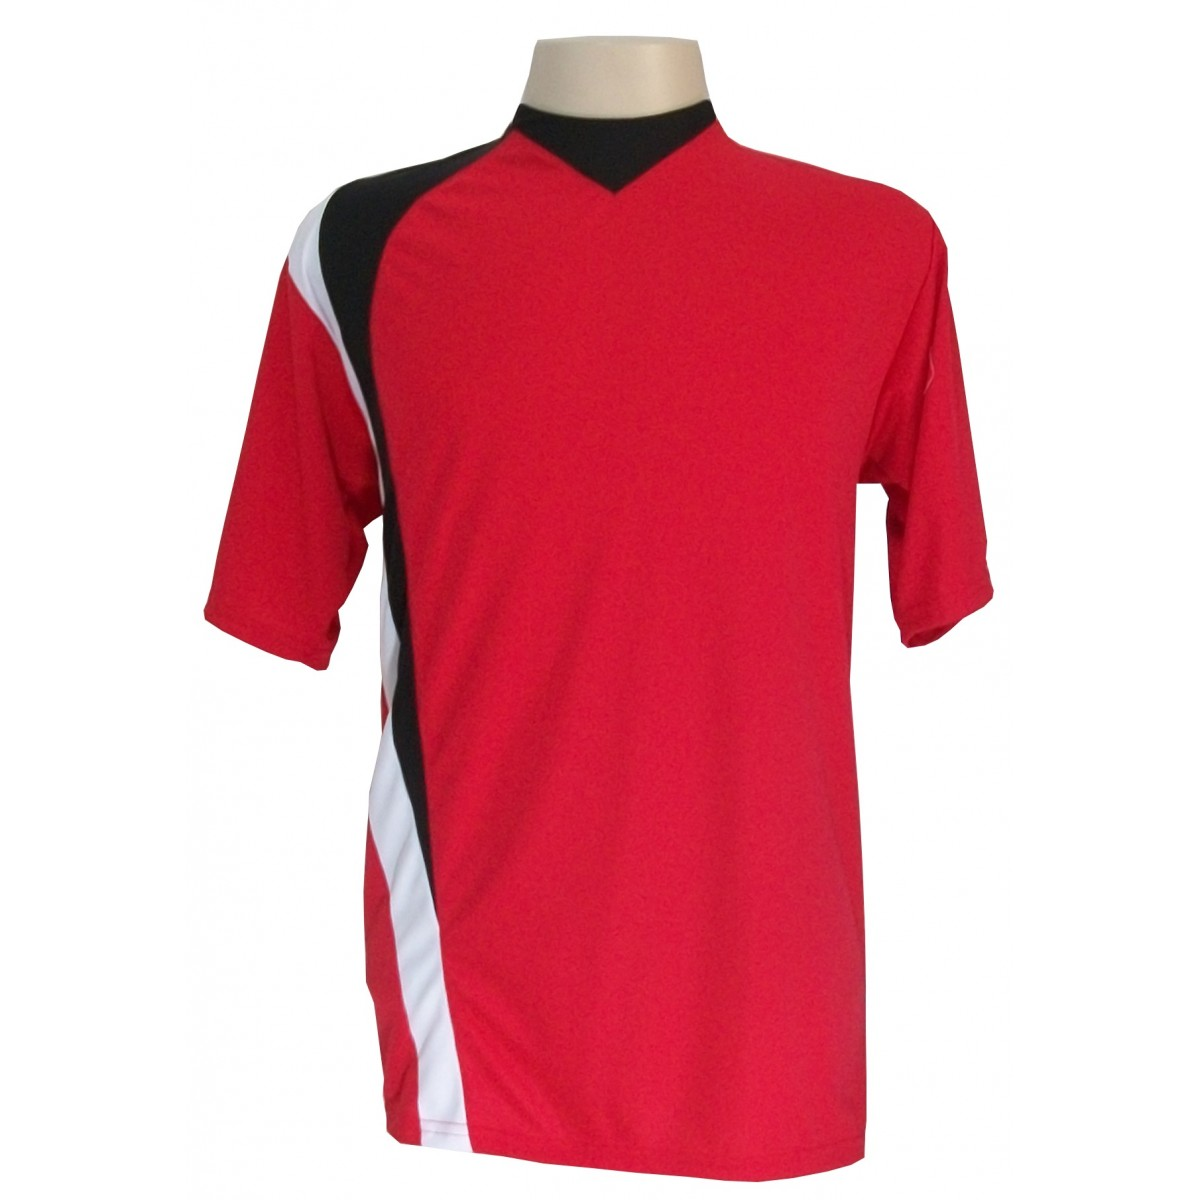 Jogo de Camisa 14 pe�as modelo PSG - Vermelho/Preto/Branco - Frete Gr�tis Brasil + Brindes